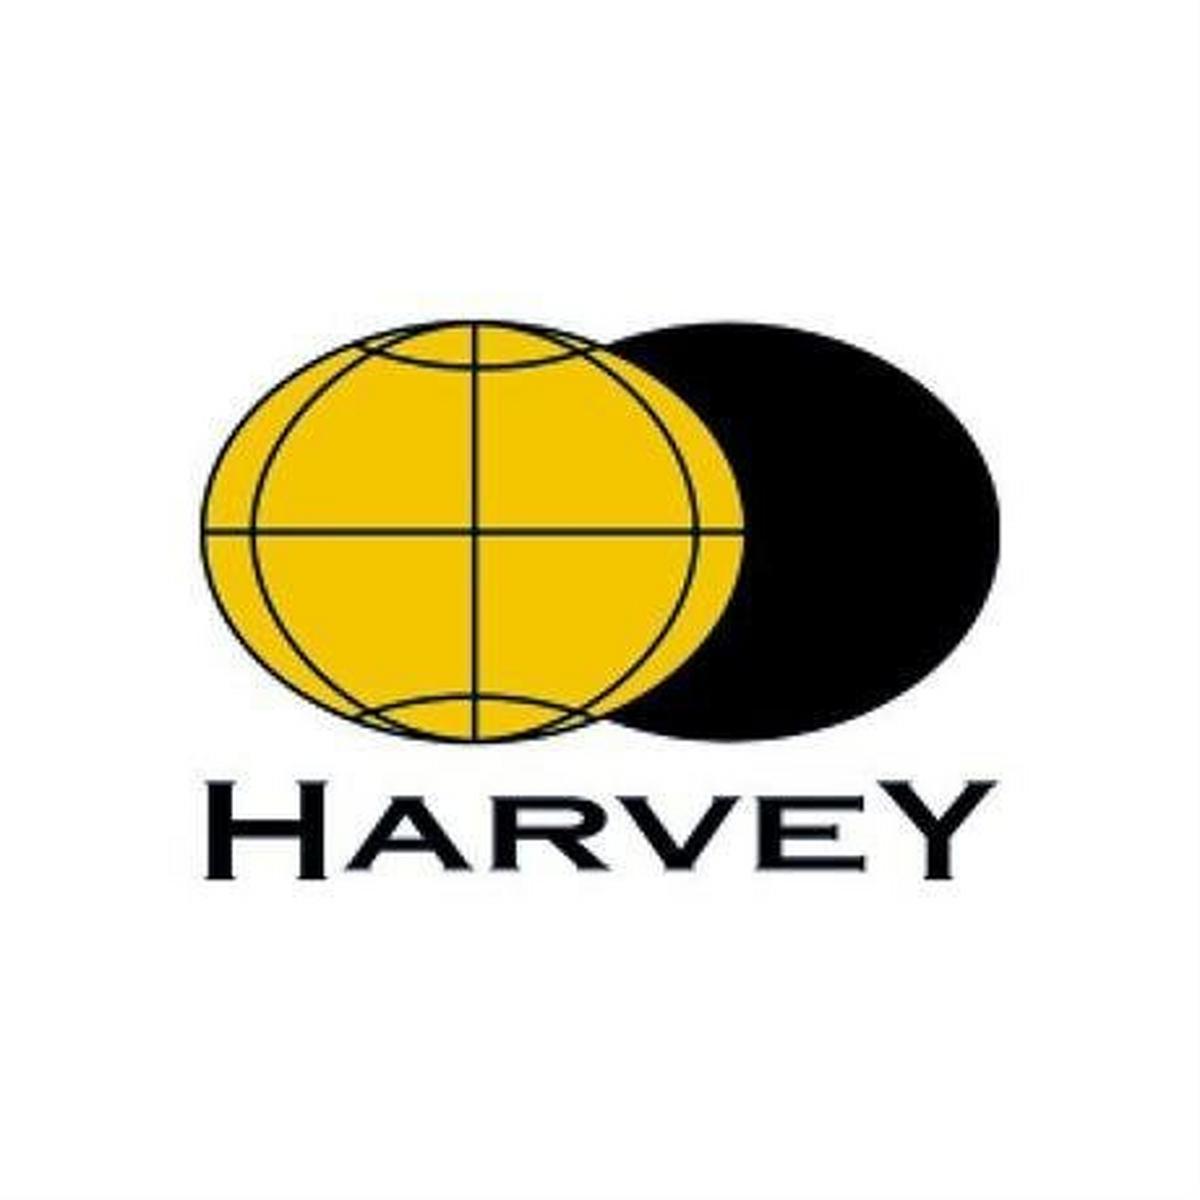 Harveys Harvey Map - XT40: Cumbria Way